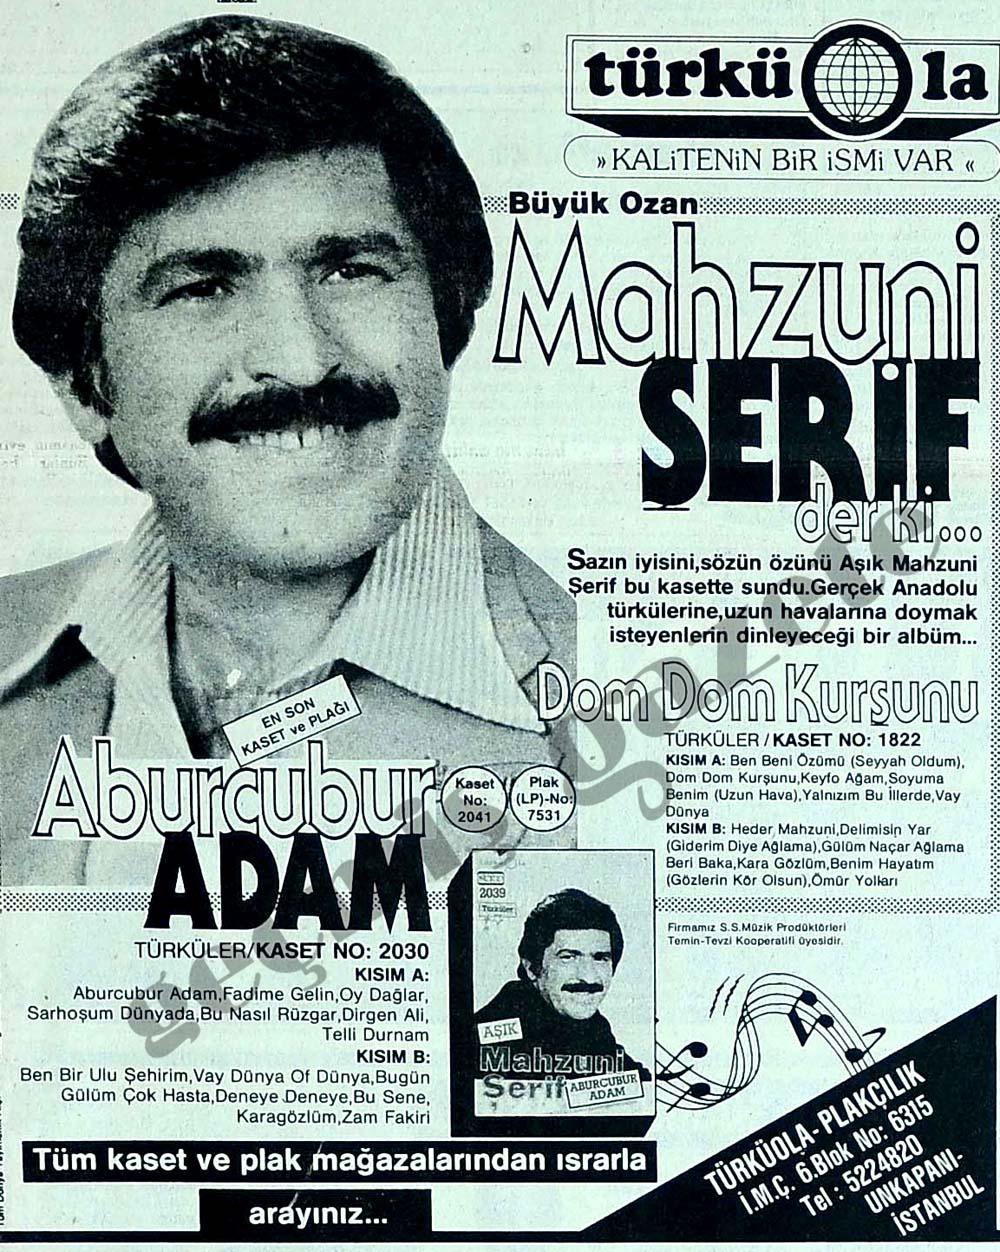 Büyük Ozan Mahzuni Şerif der ki...